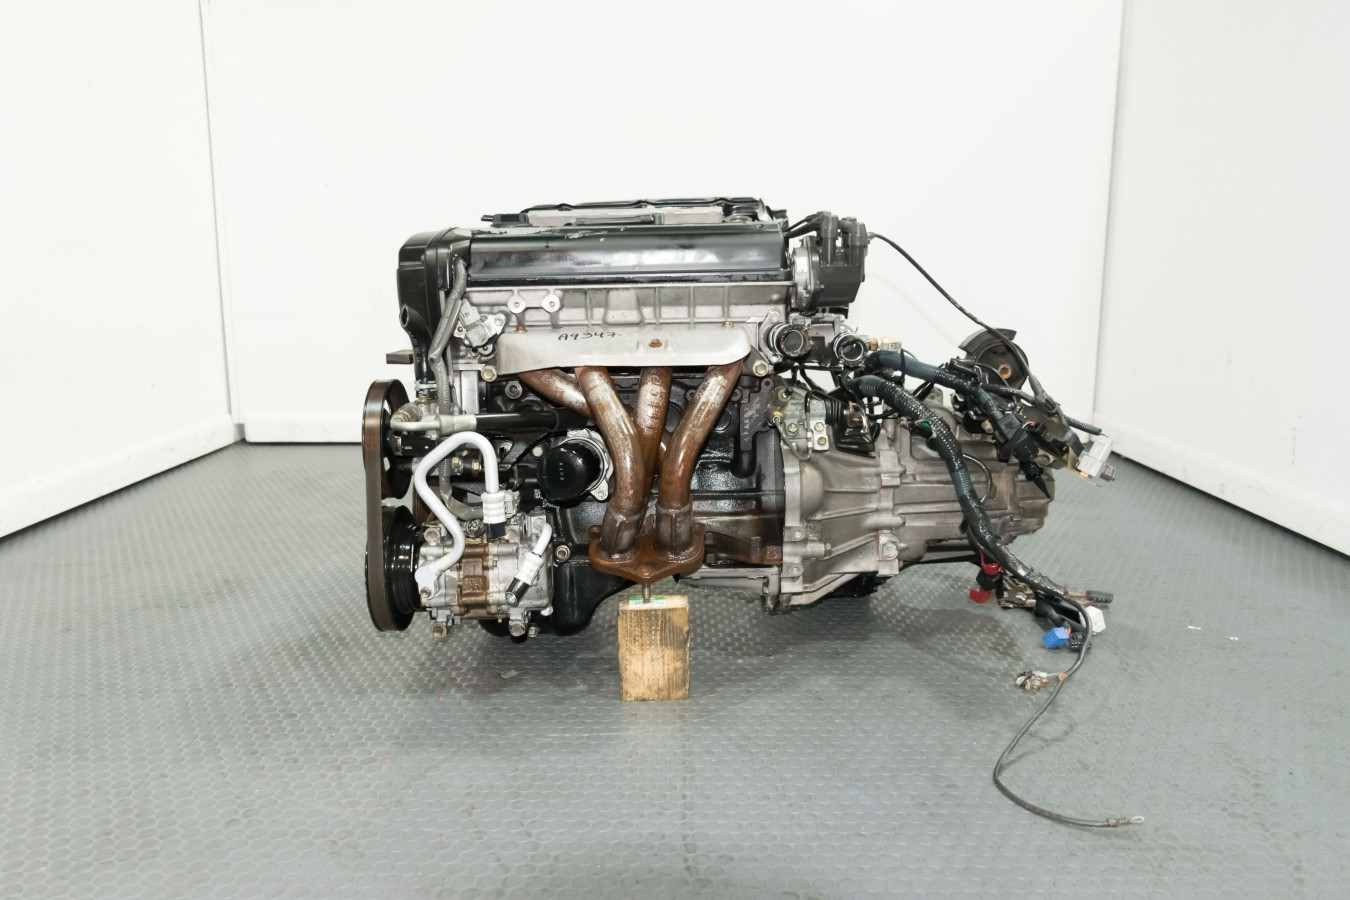 1995-2000 Toyota Corolla 1 6L Twin CAM 4 Cylinder 20 Valve Blacktop 4age  Engine 5mt Swap Ecu Harness